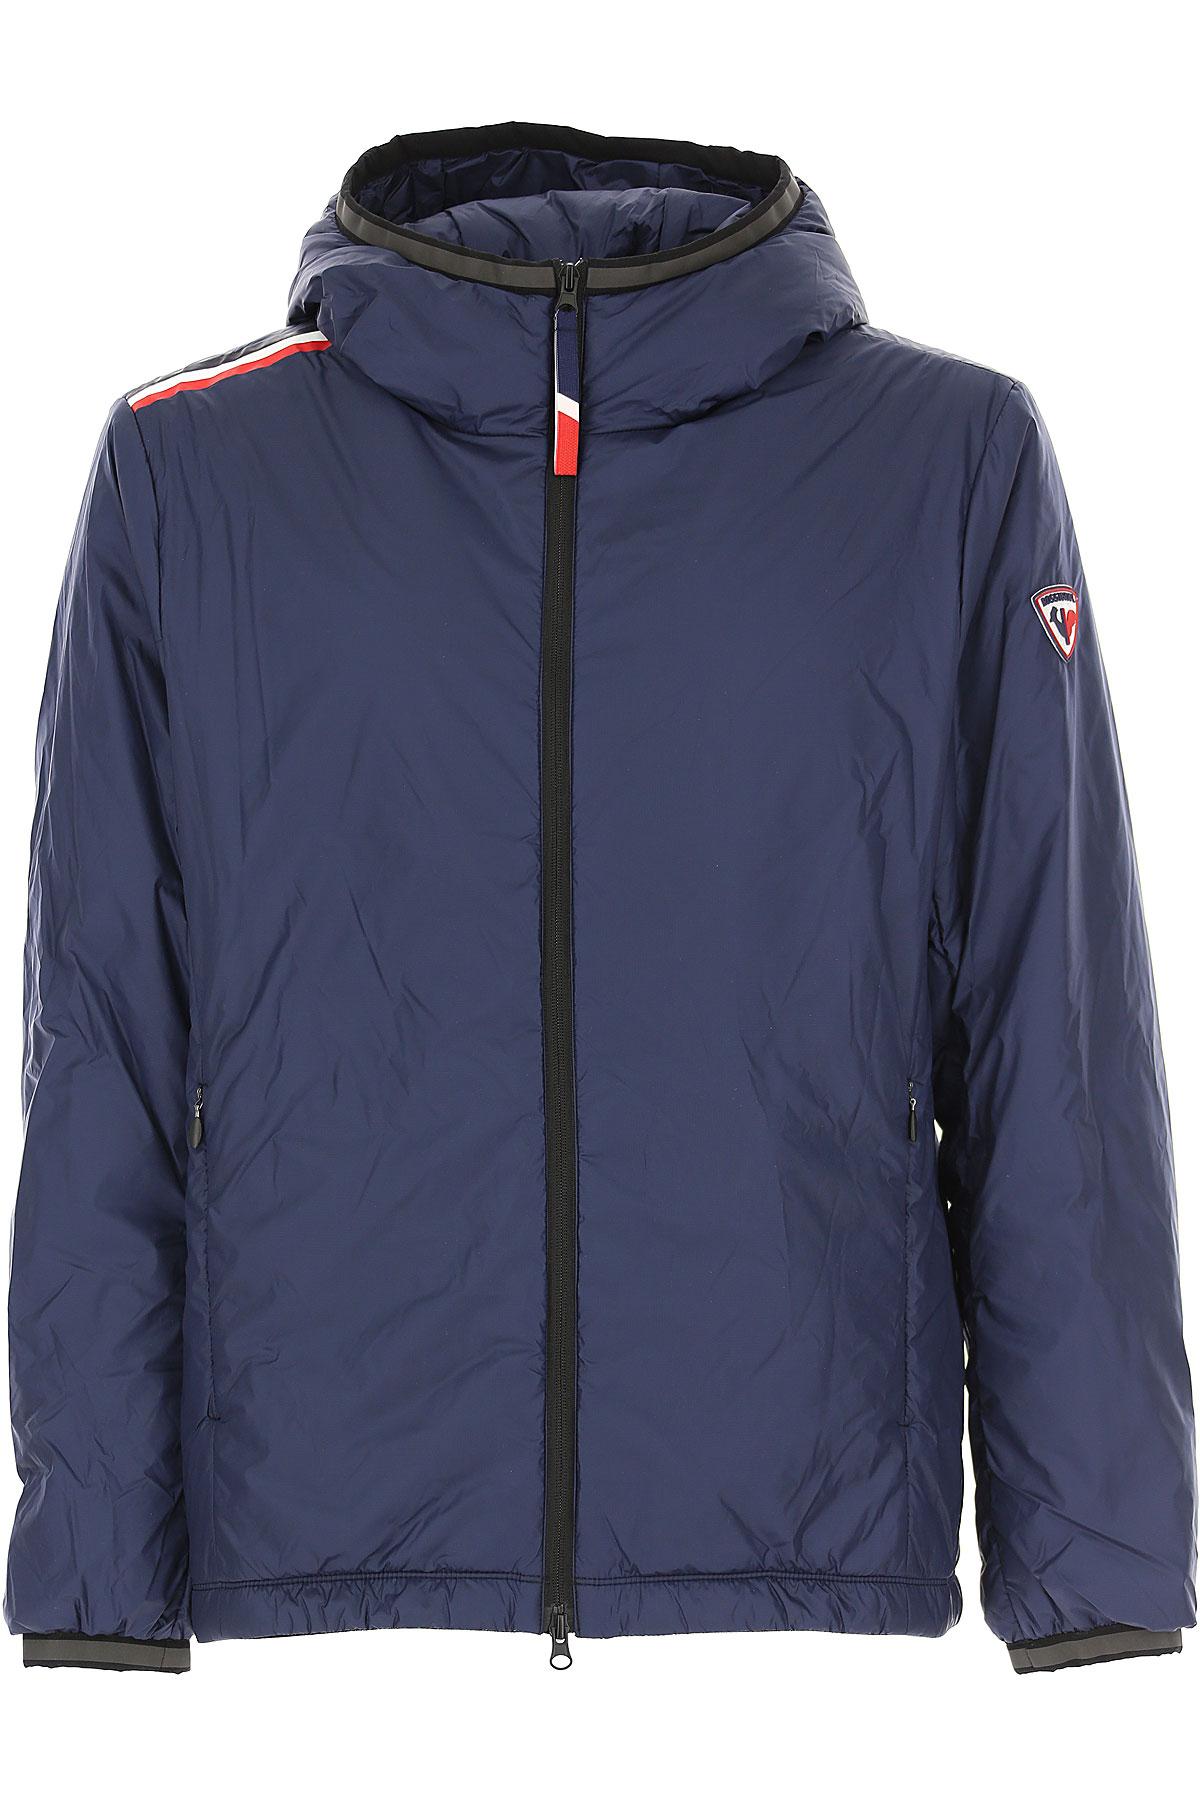 Rossignol Down Jacket for Men, Puffer Ski Jacket, dark Navy, polyamide, 2019, L M